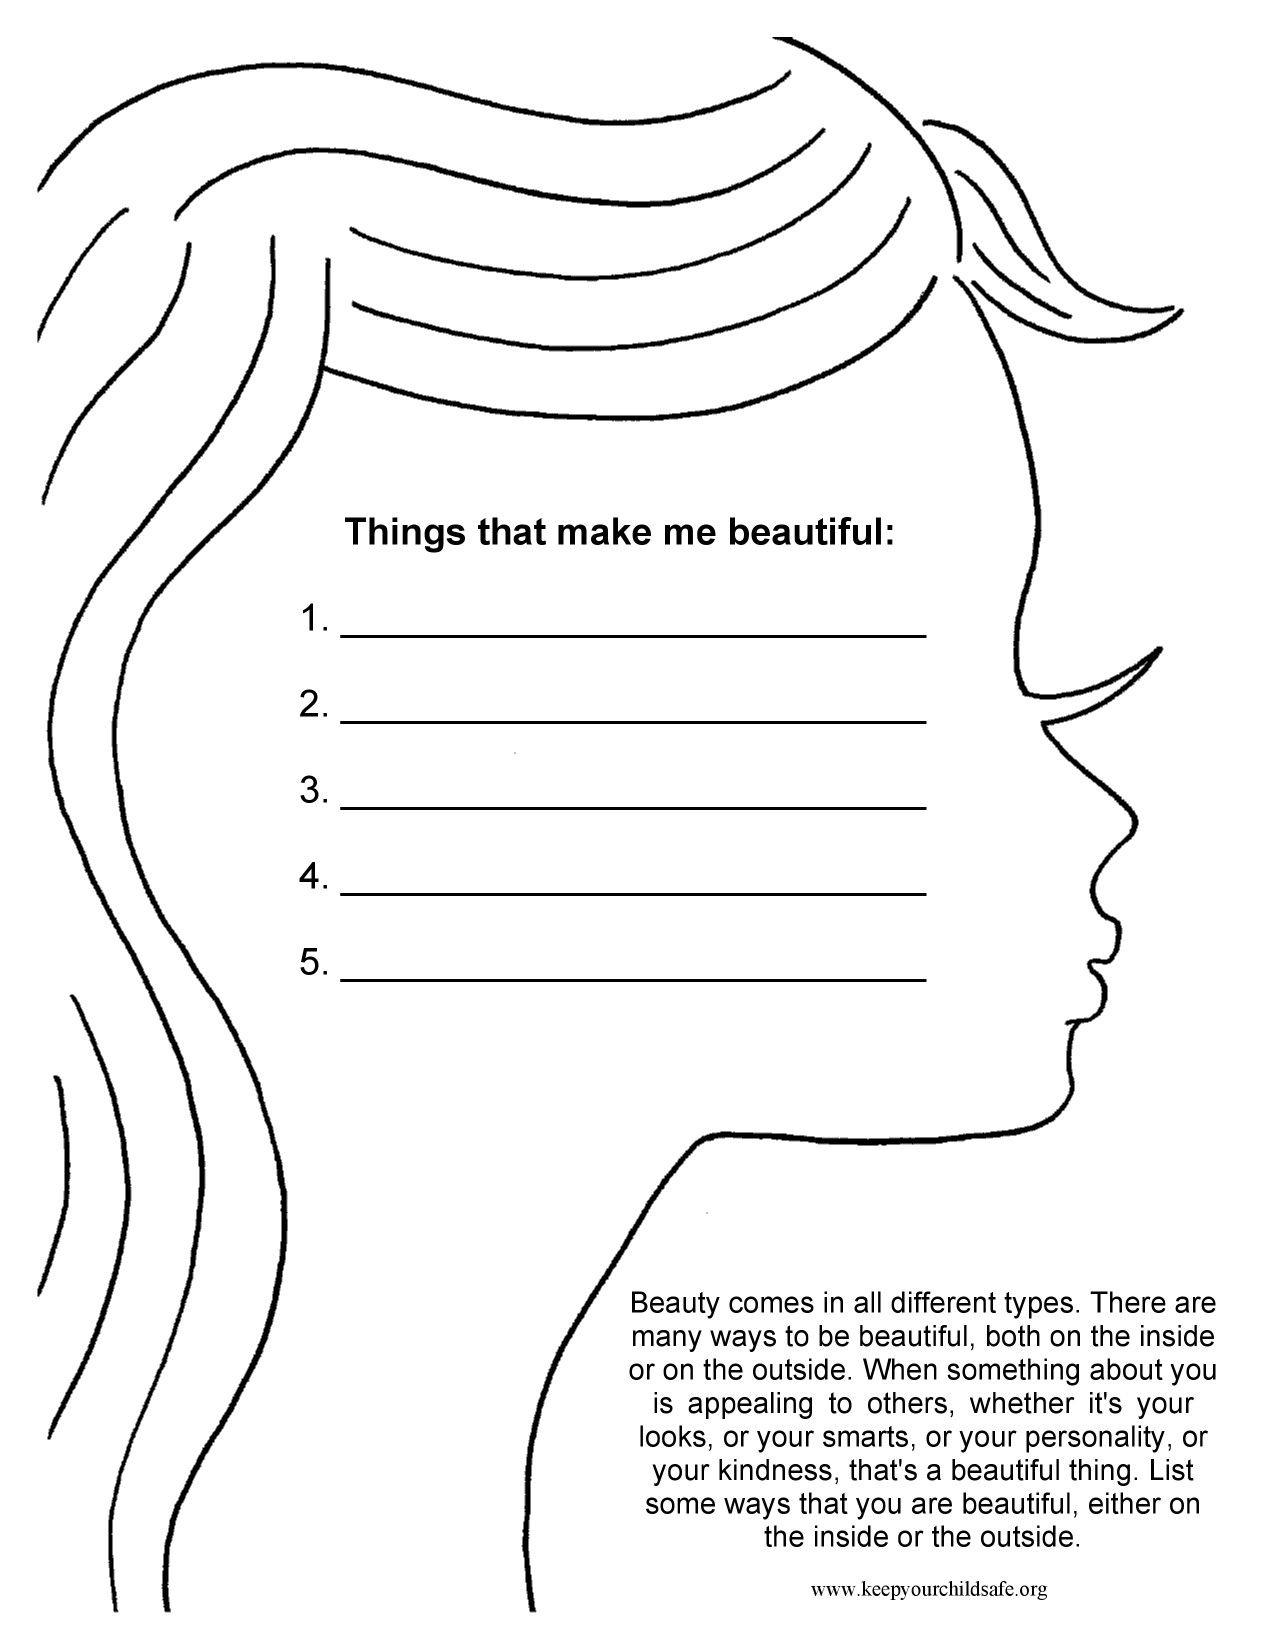 Things That Make Me Beautiful | Self Esteem Worksheets